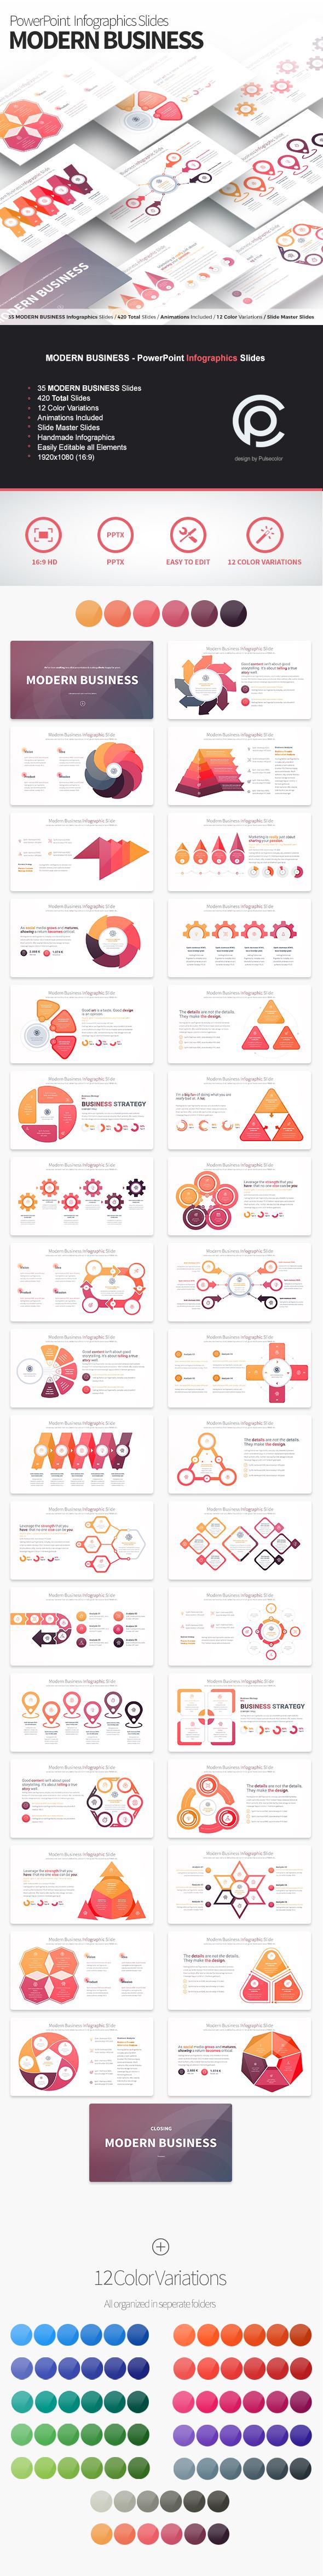 Modern Business - PowerPoint Infographics Slides